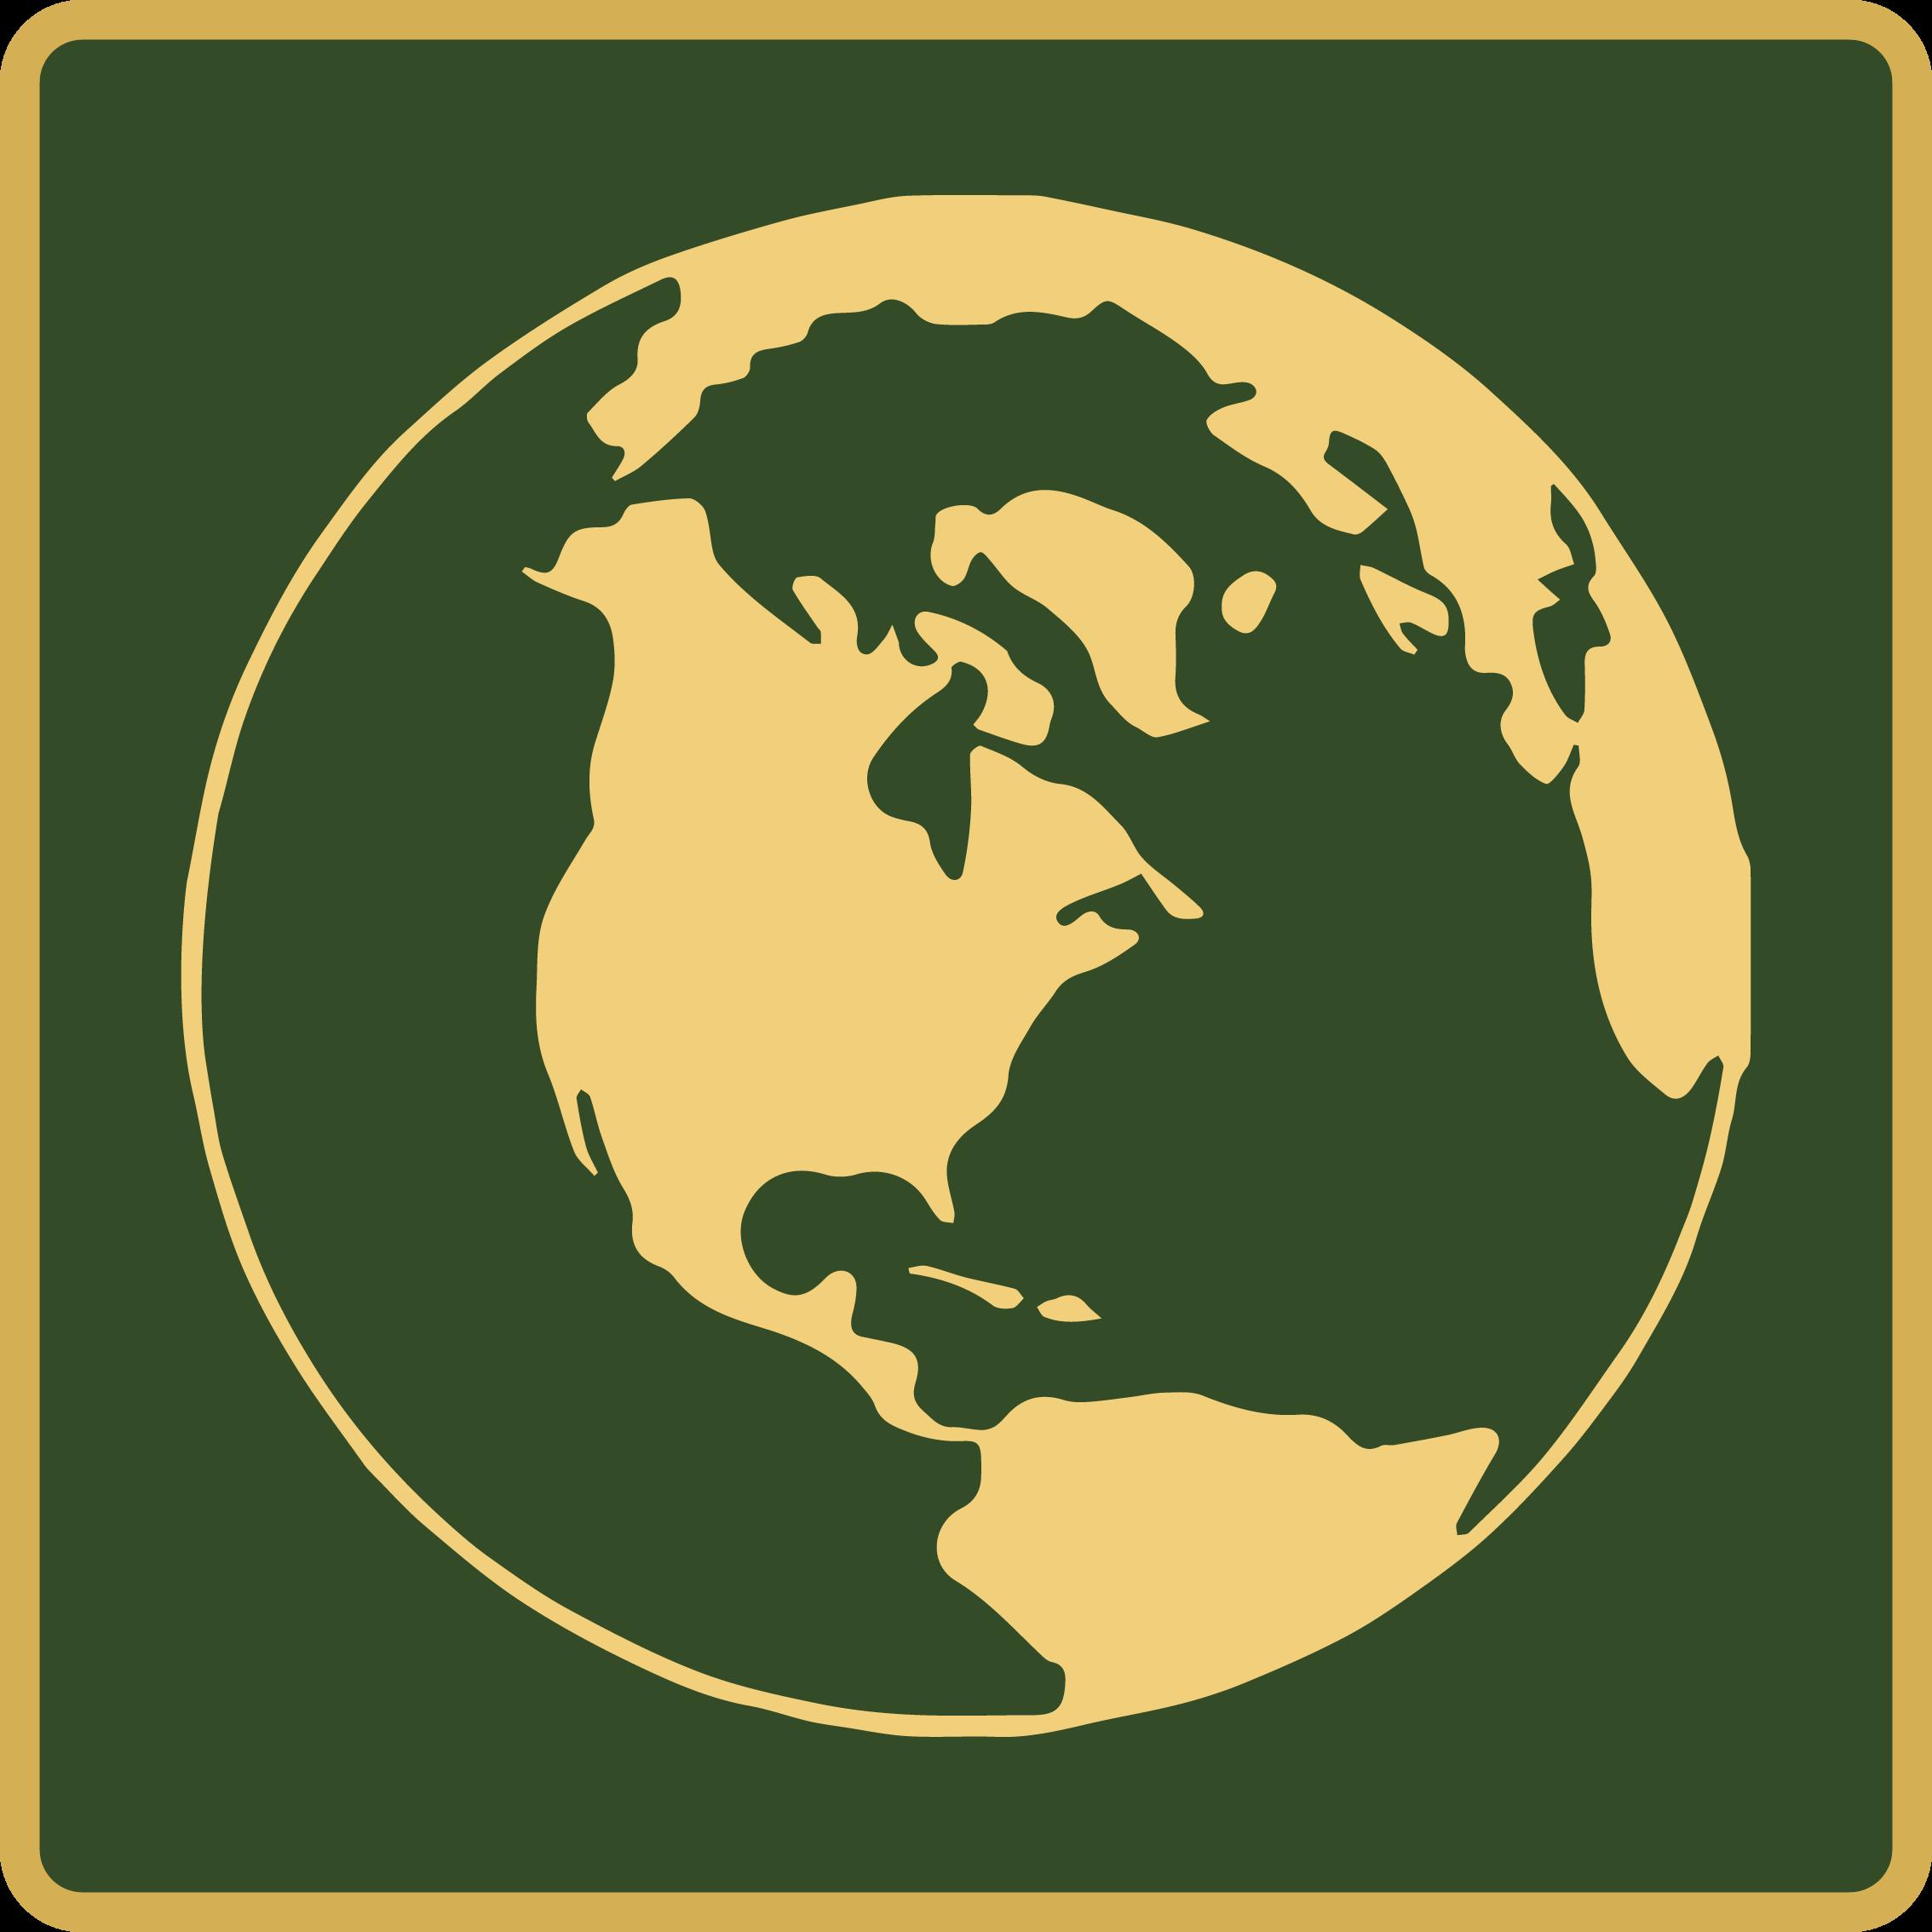 Drop-In Volunteering Logo